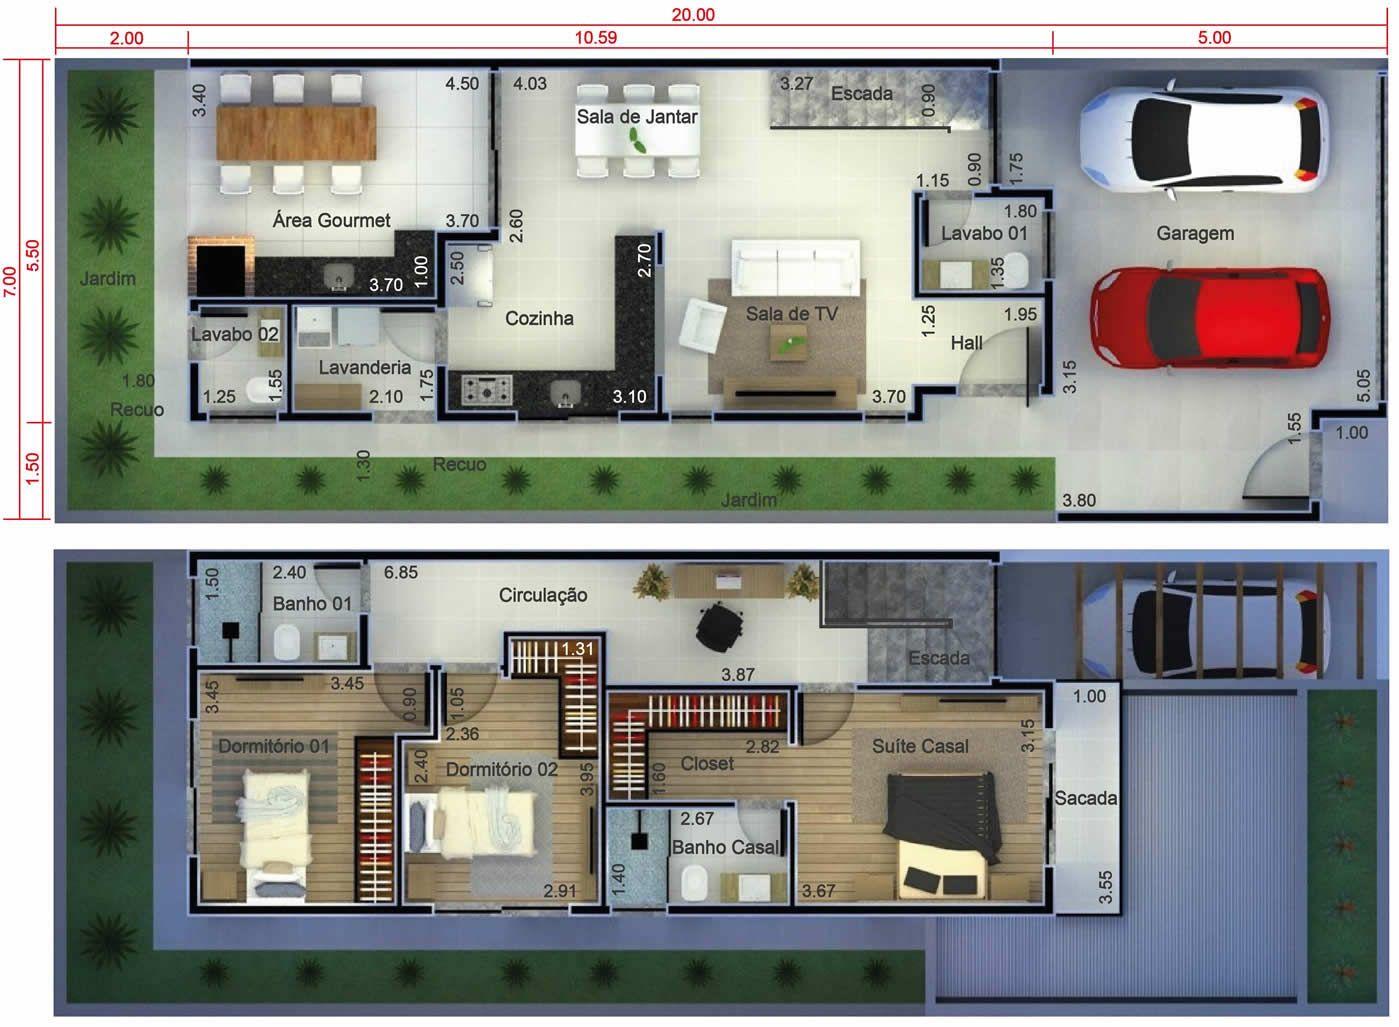 Amado Plano de casa para terreno de 7x20. Plano para terreno 7x20  DZ93